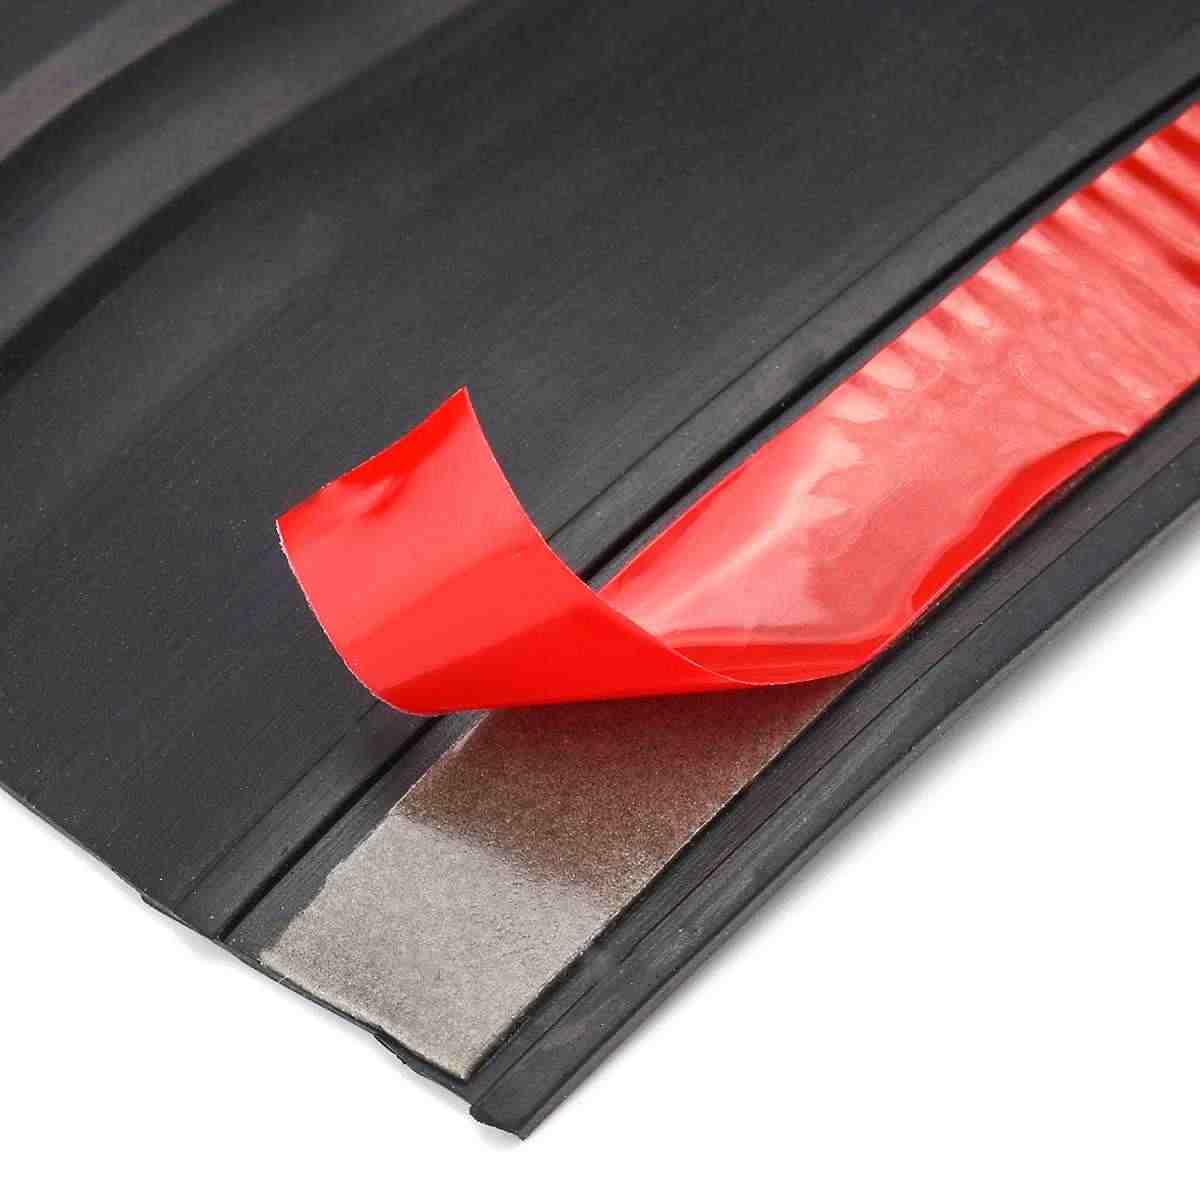 FSLLOVE FANGSHUILIN 170cm Car Rubber Rear Bumper Guard Protector Tailgate Seal Trim Cover Protection Universal